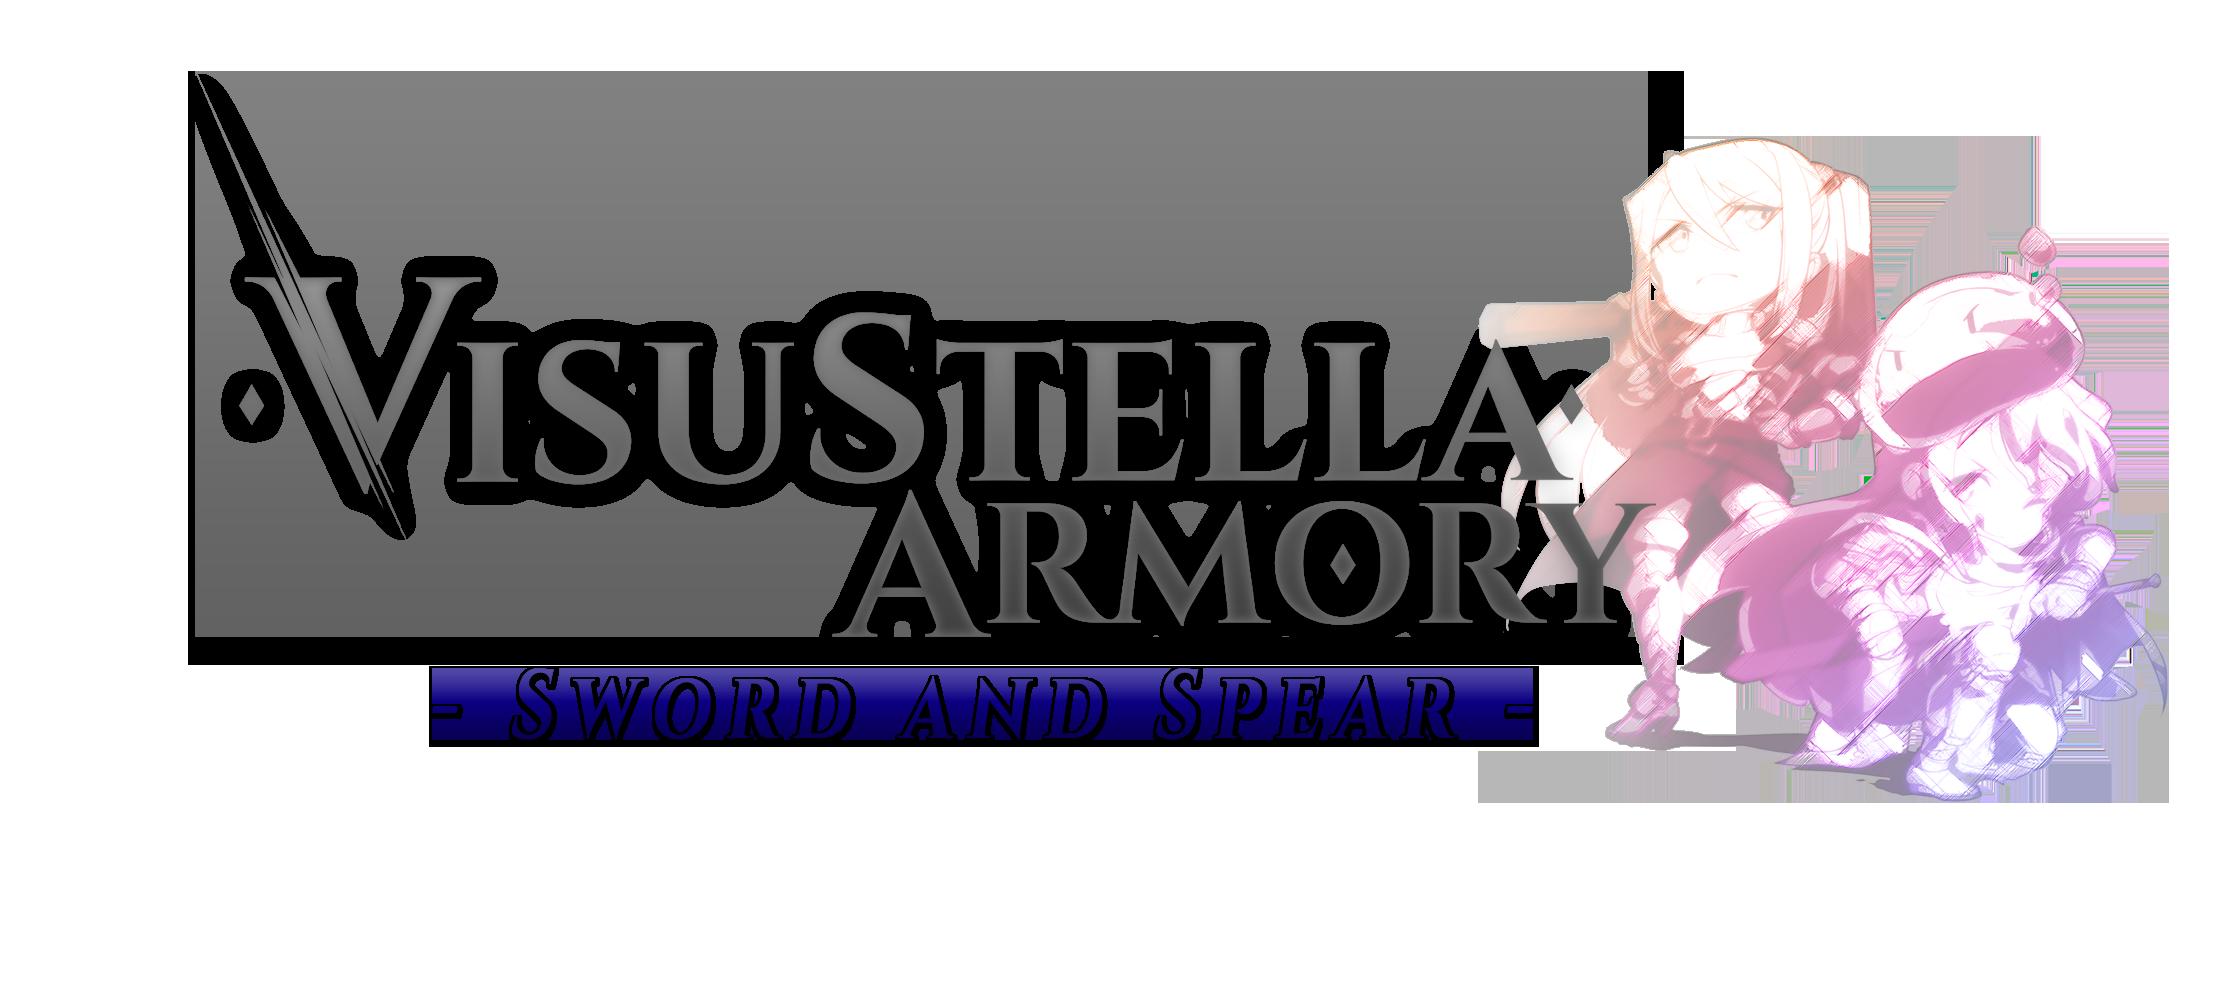 VisuStella Armory - Sword and Spear